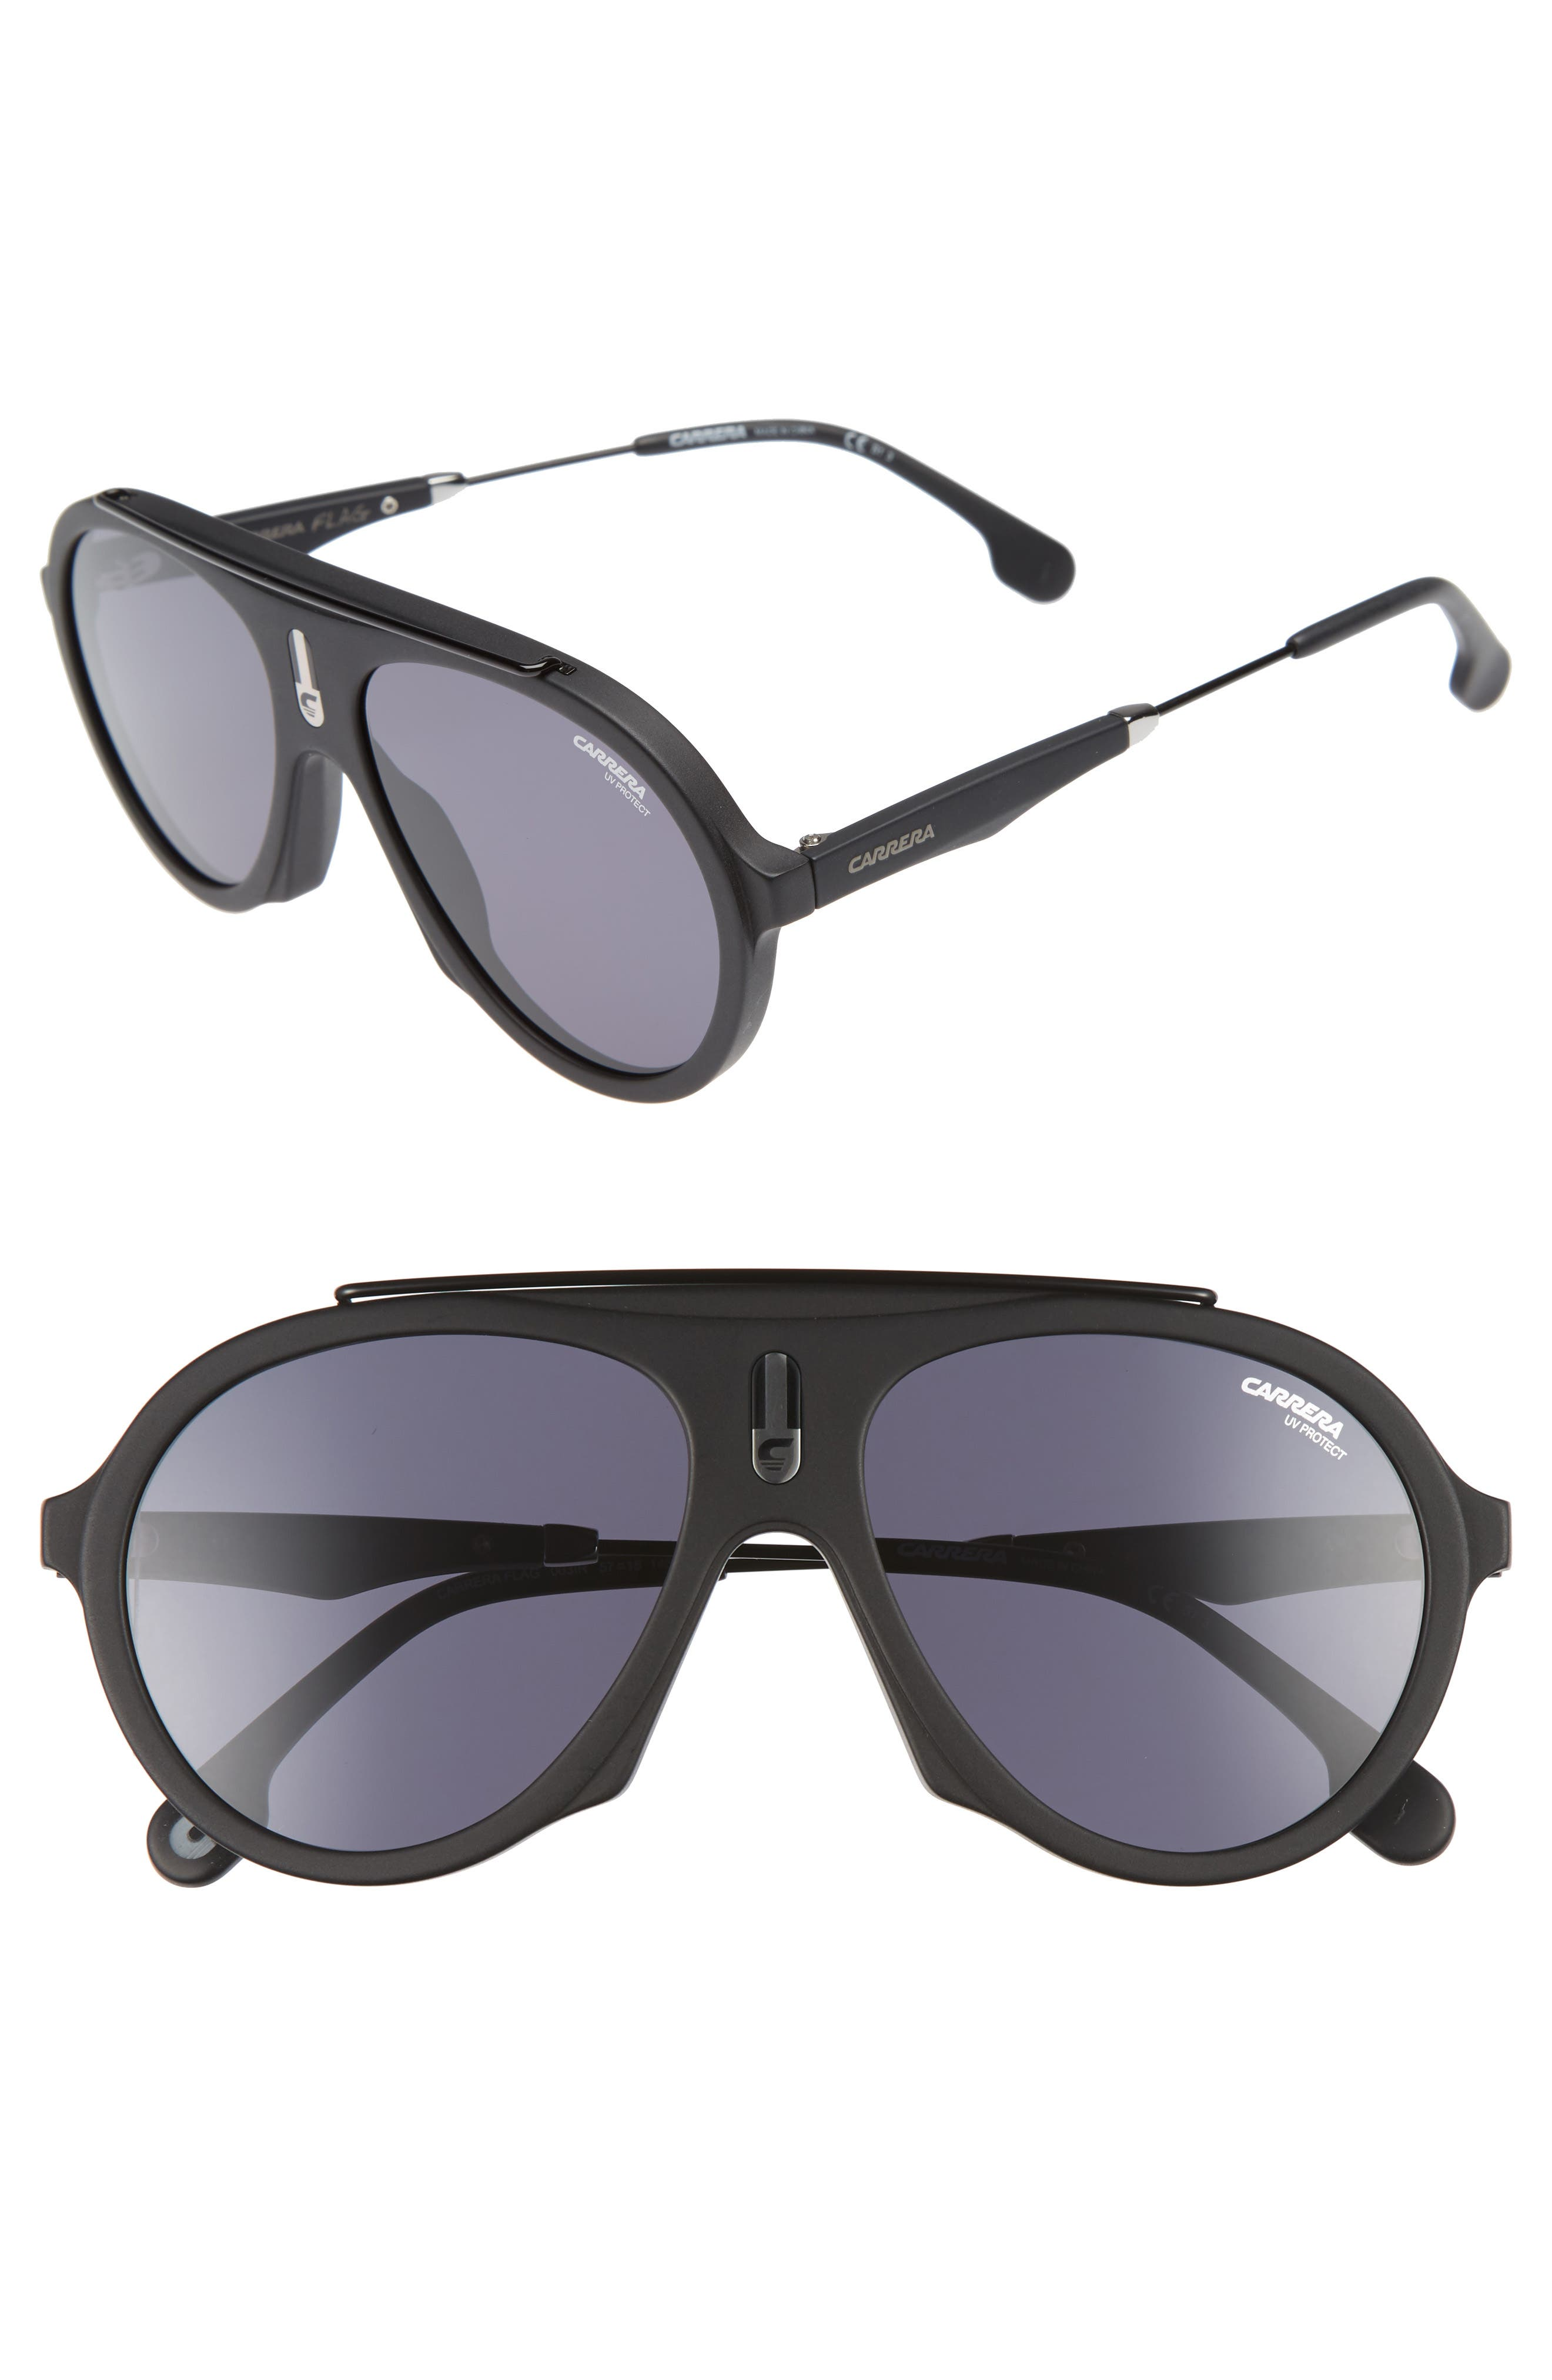 Main Image - Carrera Flag 57mm Mirrored Pilot Sunglasses